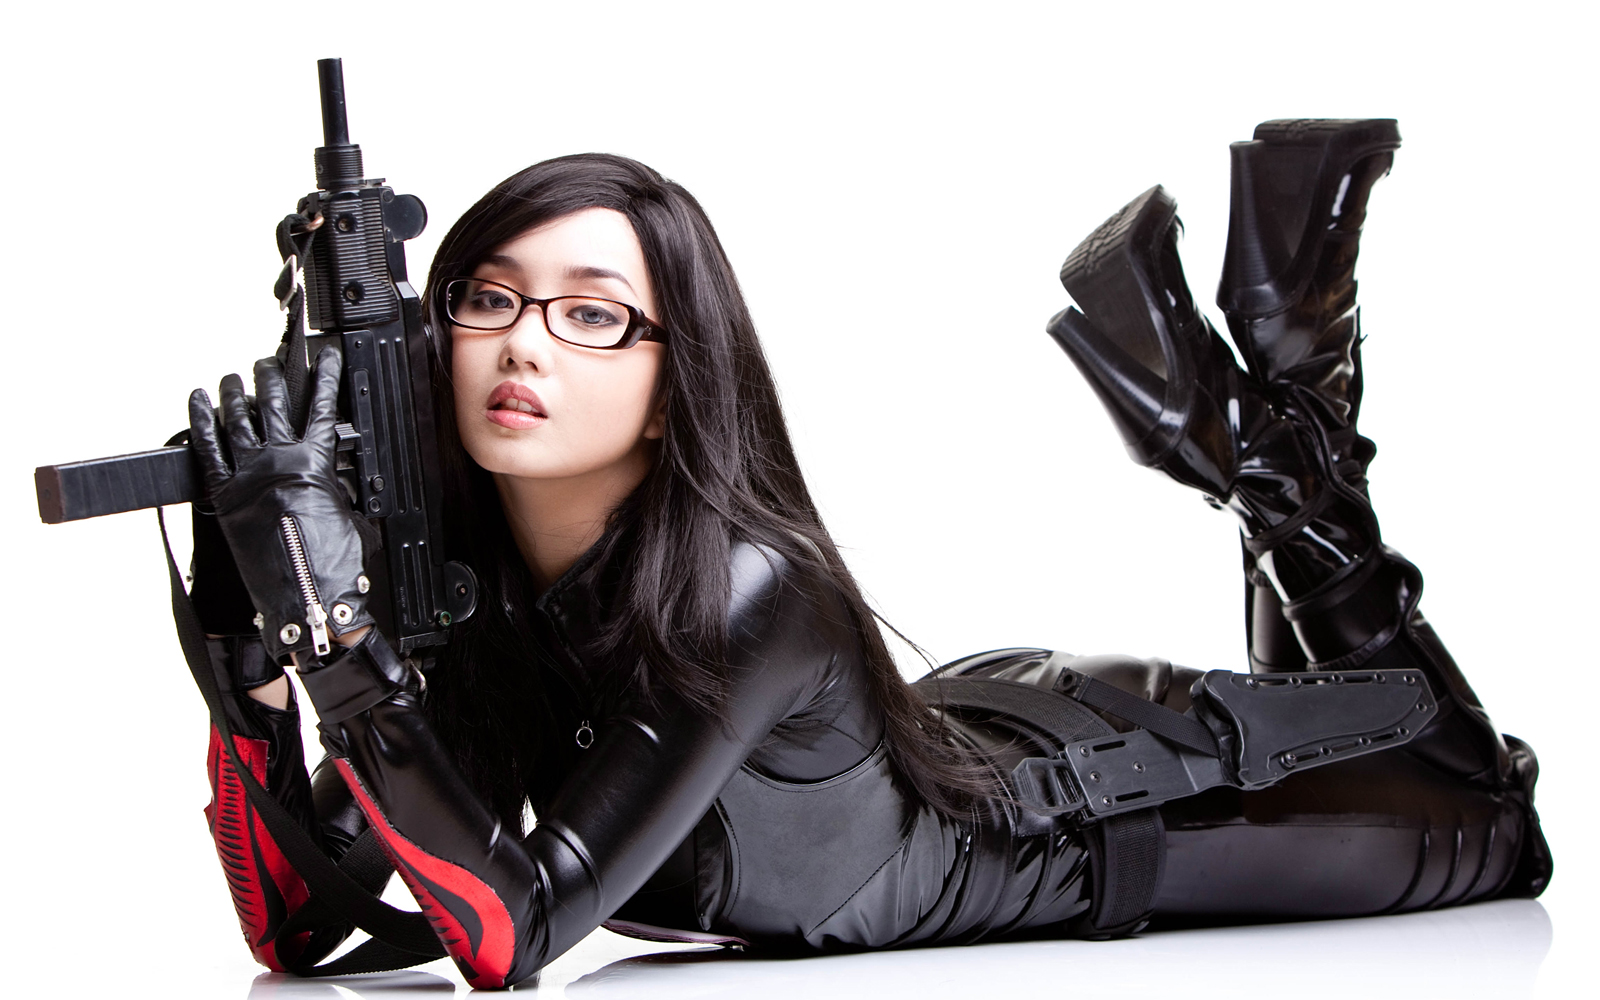 Think, bad girls with guns